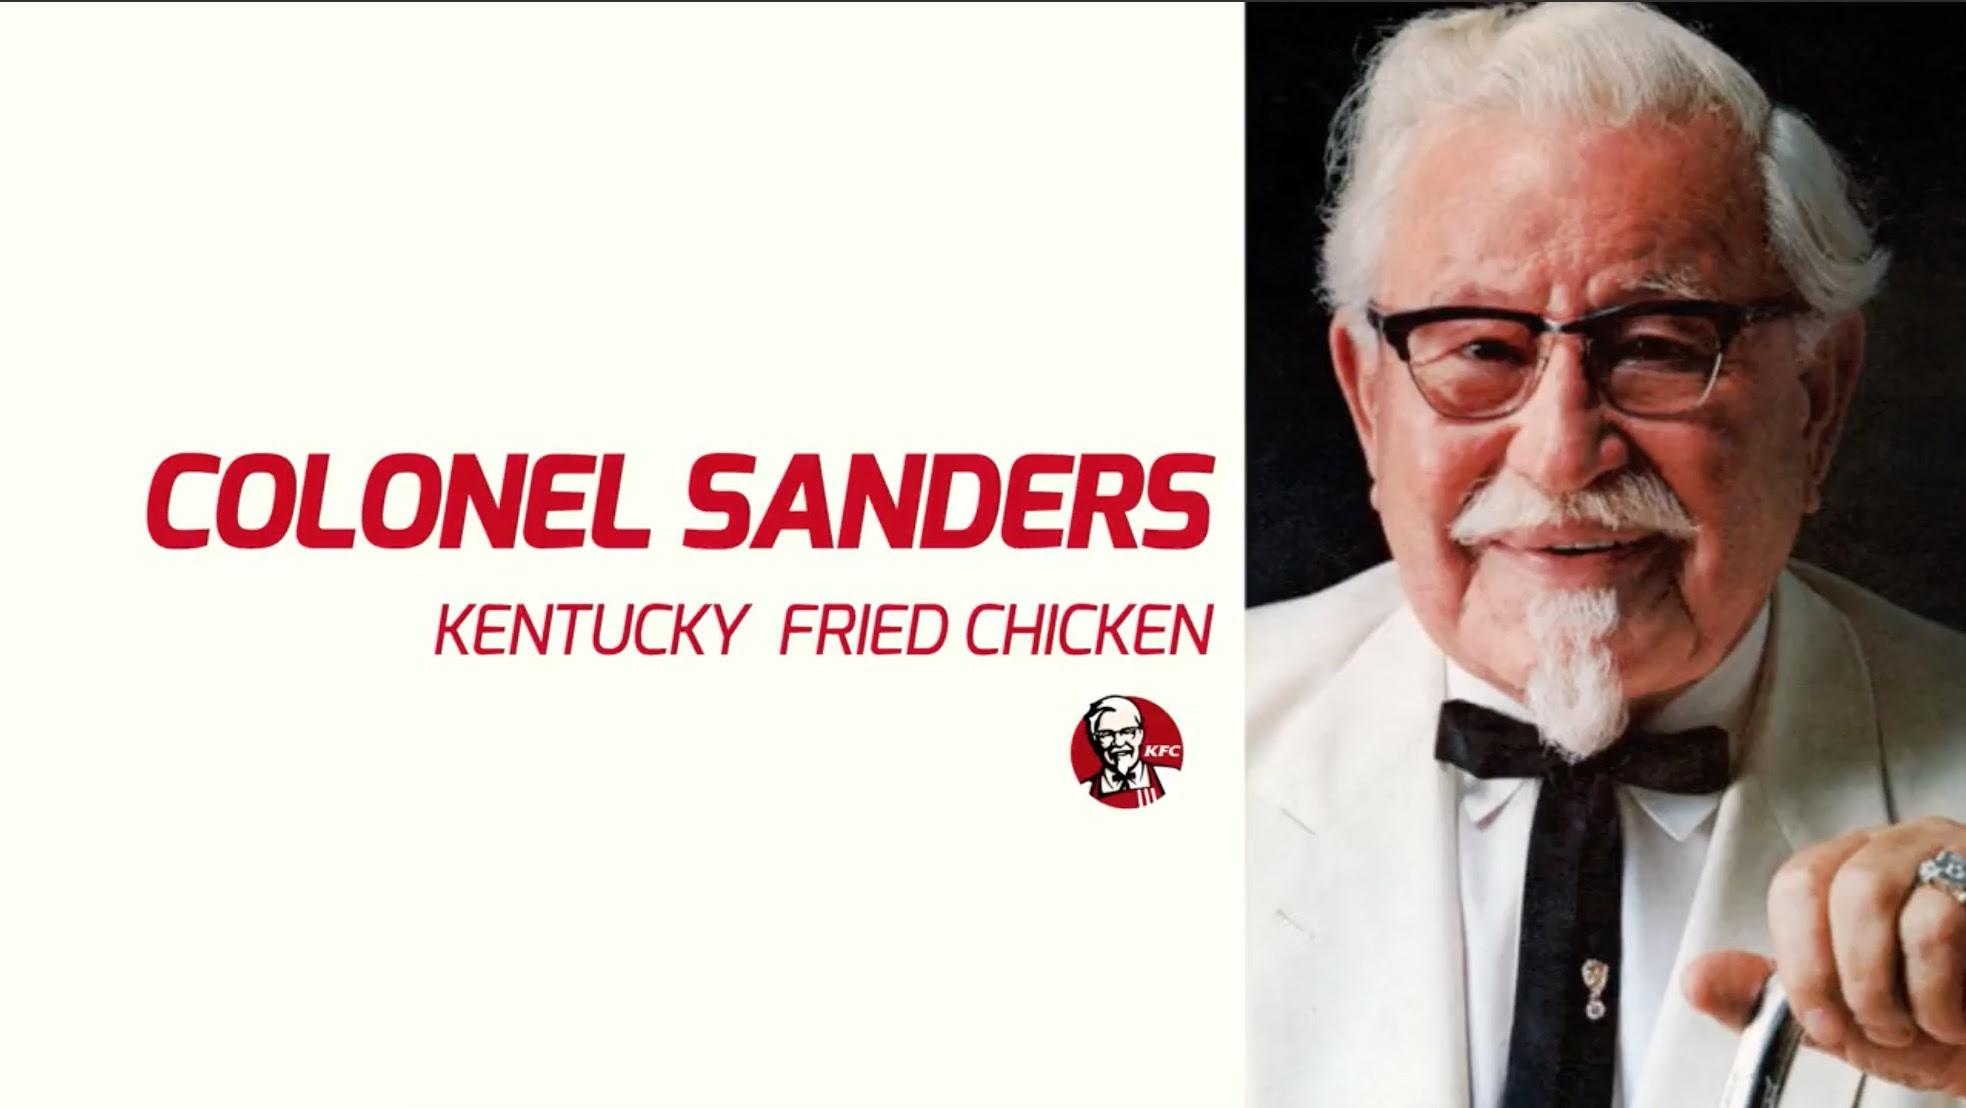 Colonel sanders Biography